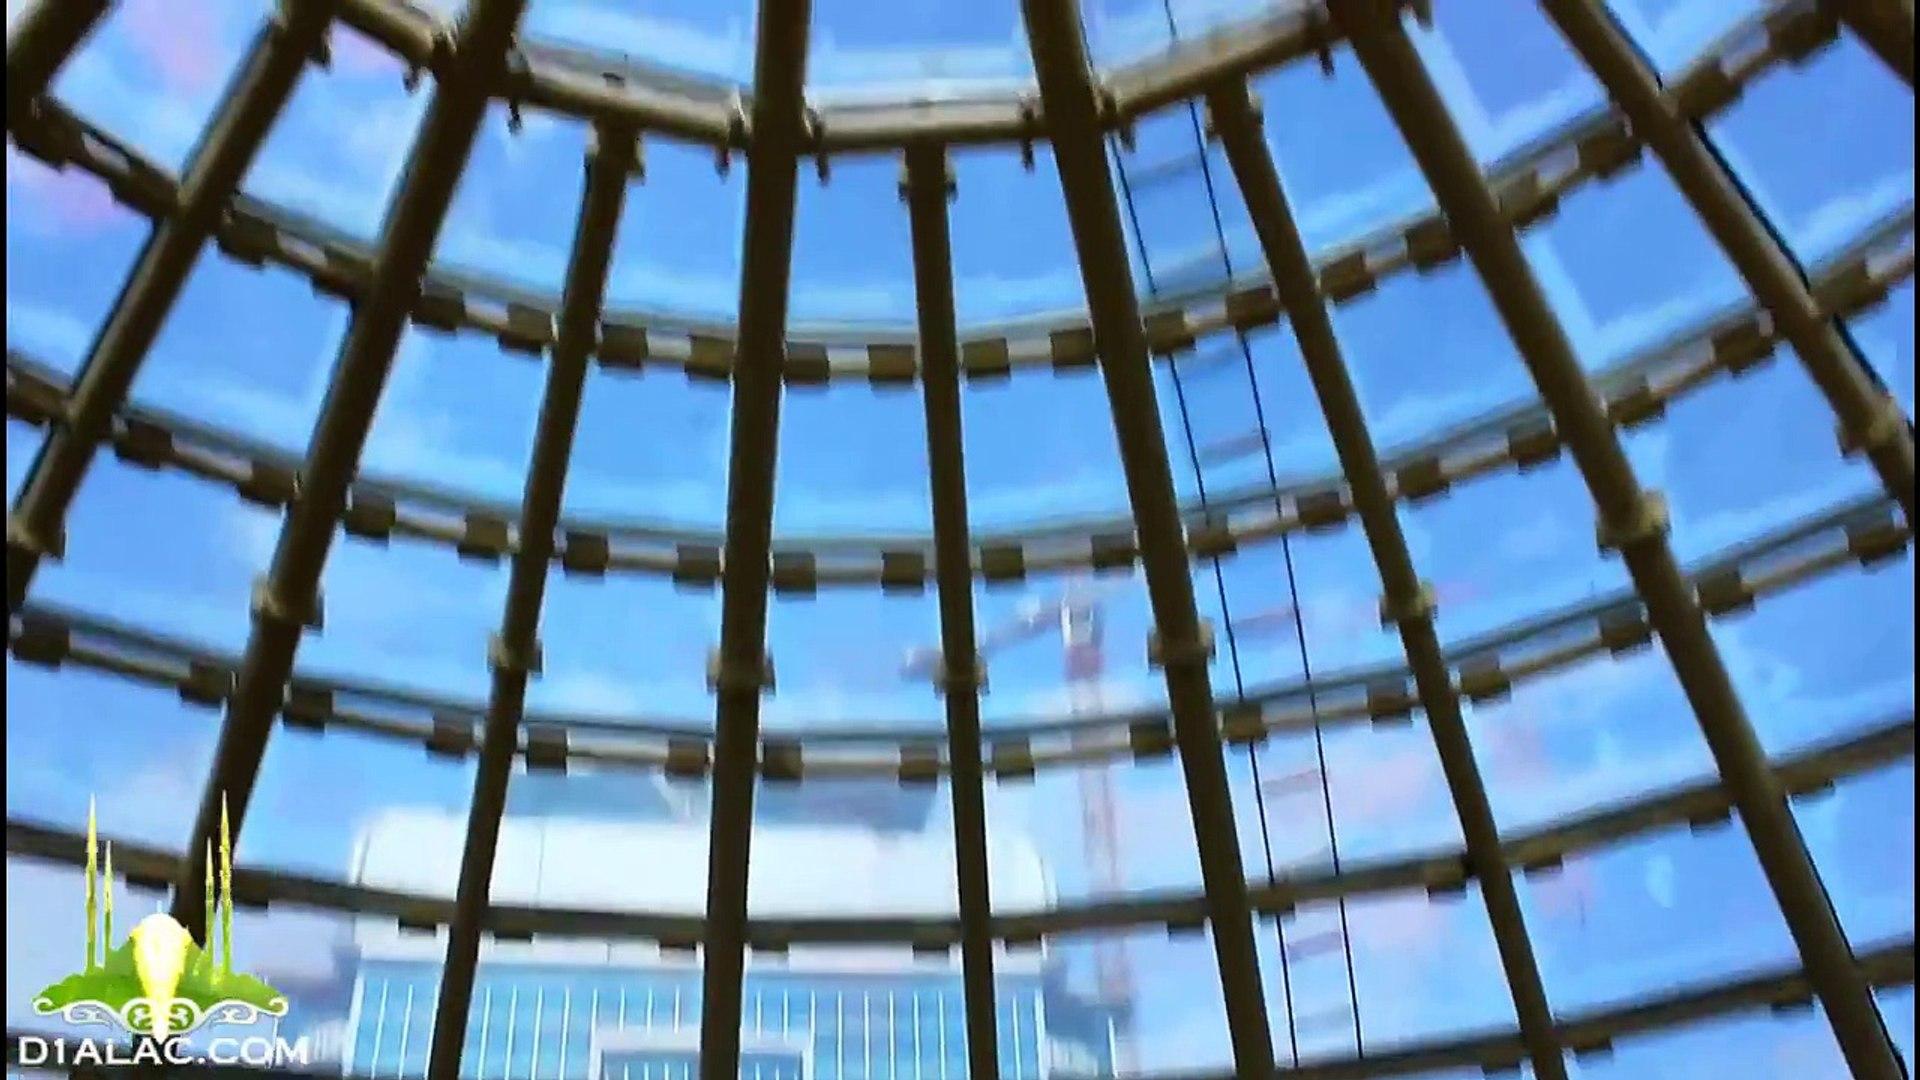 Прогулка в Отеле Грозный сити (Чечня) Walk Hotel Grozny City (Chechnya)